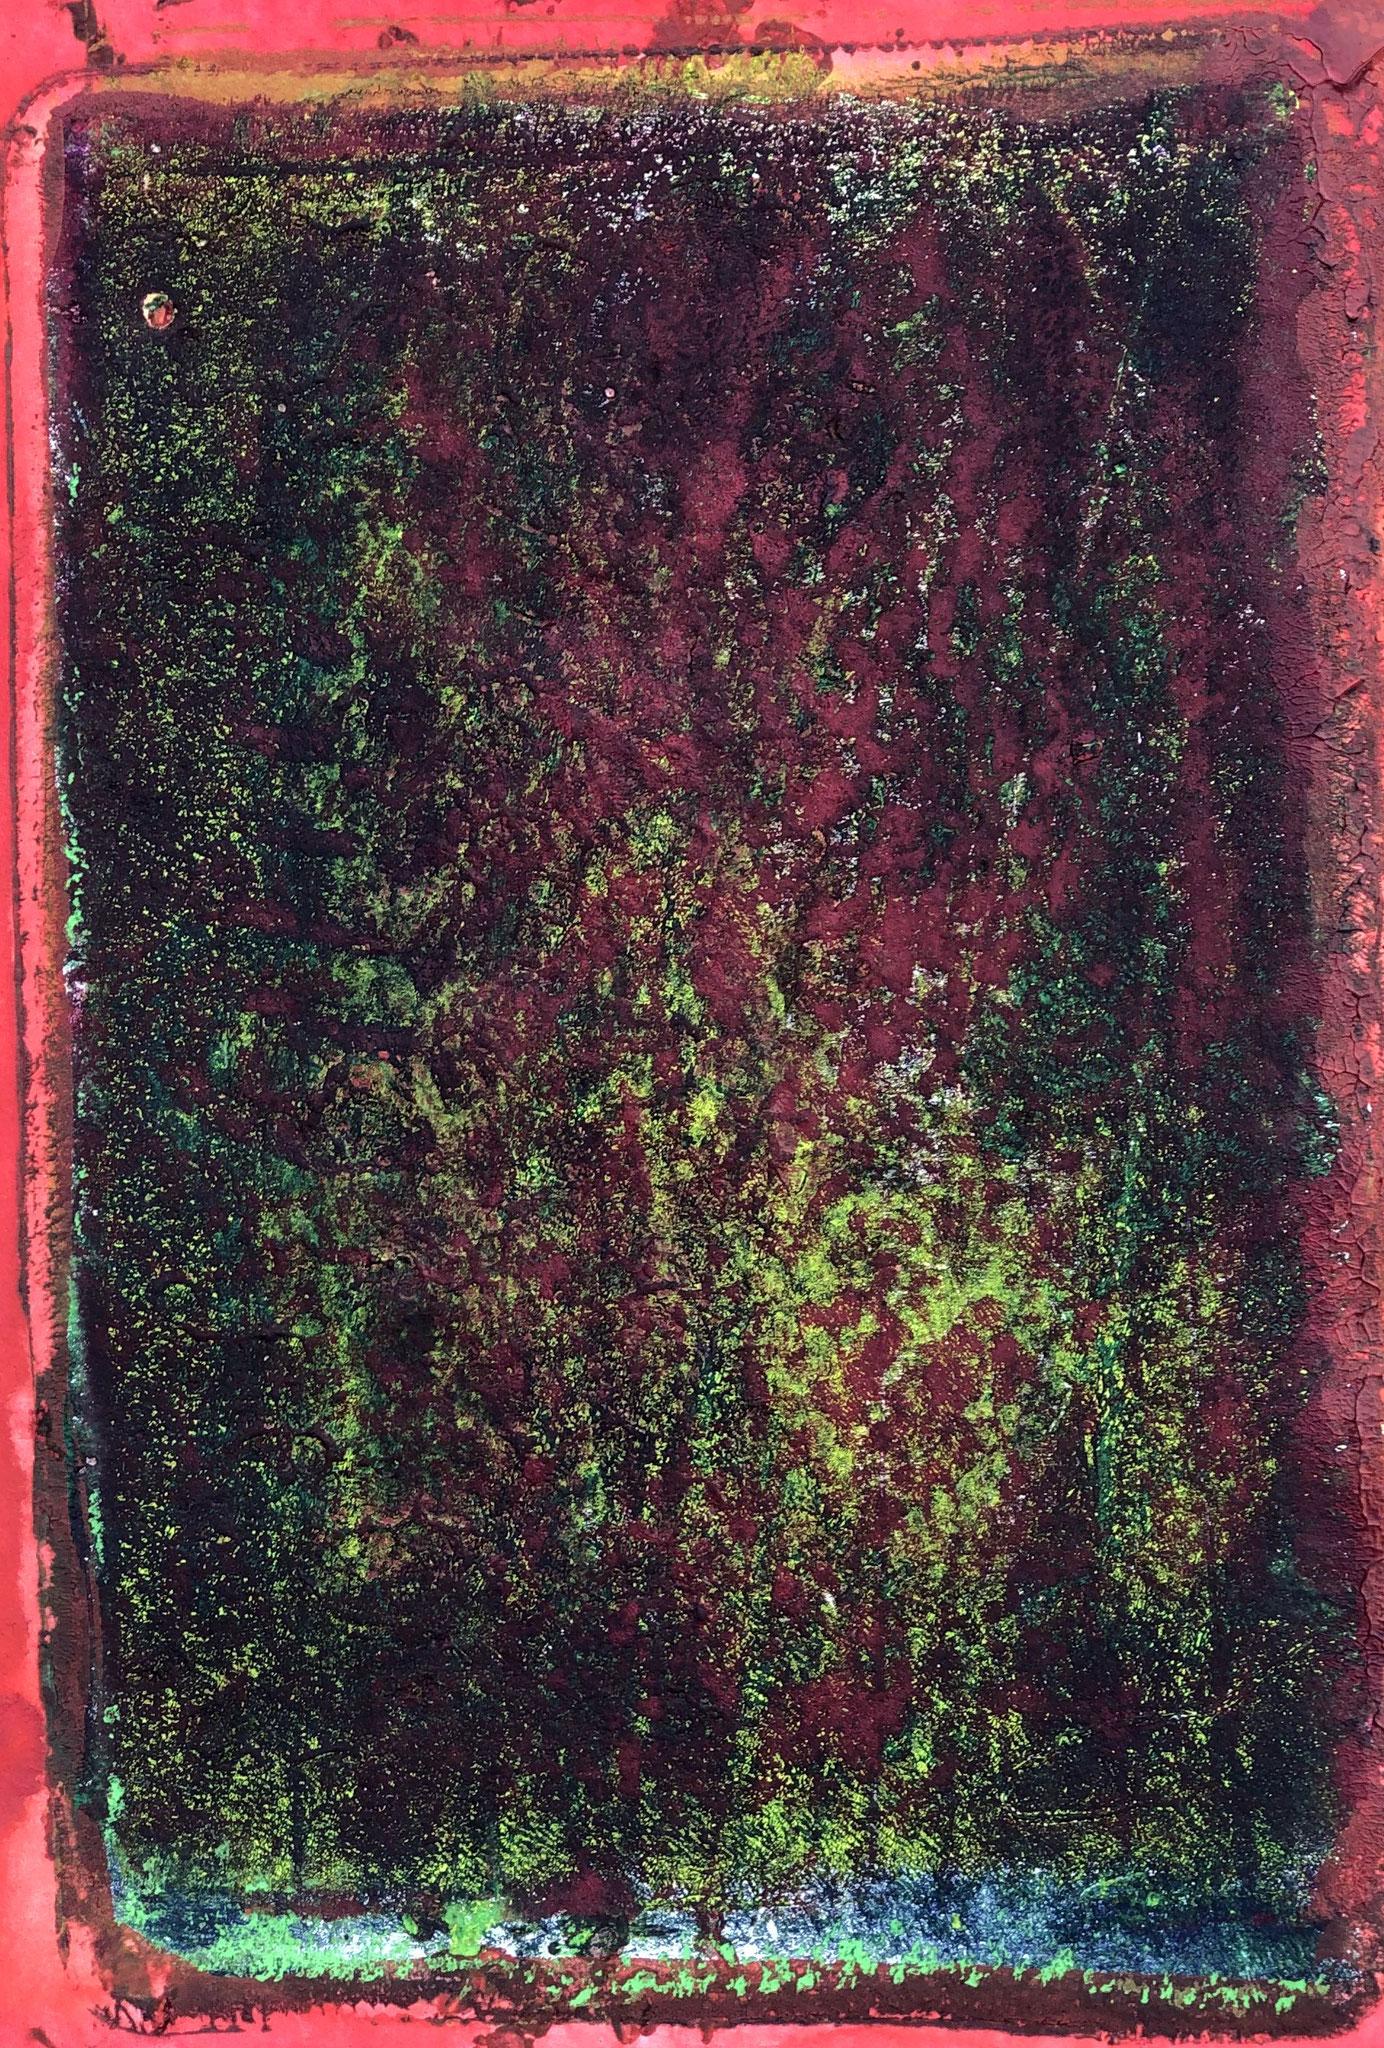 WINGS-BE BE BOP Acryl auf Papier - 36 x 48 cm